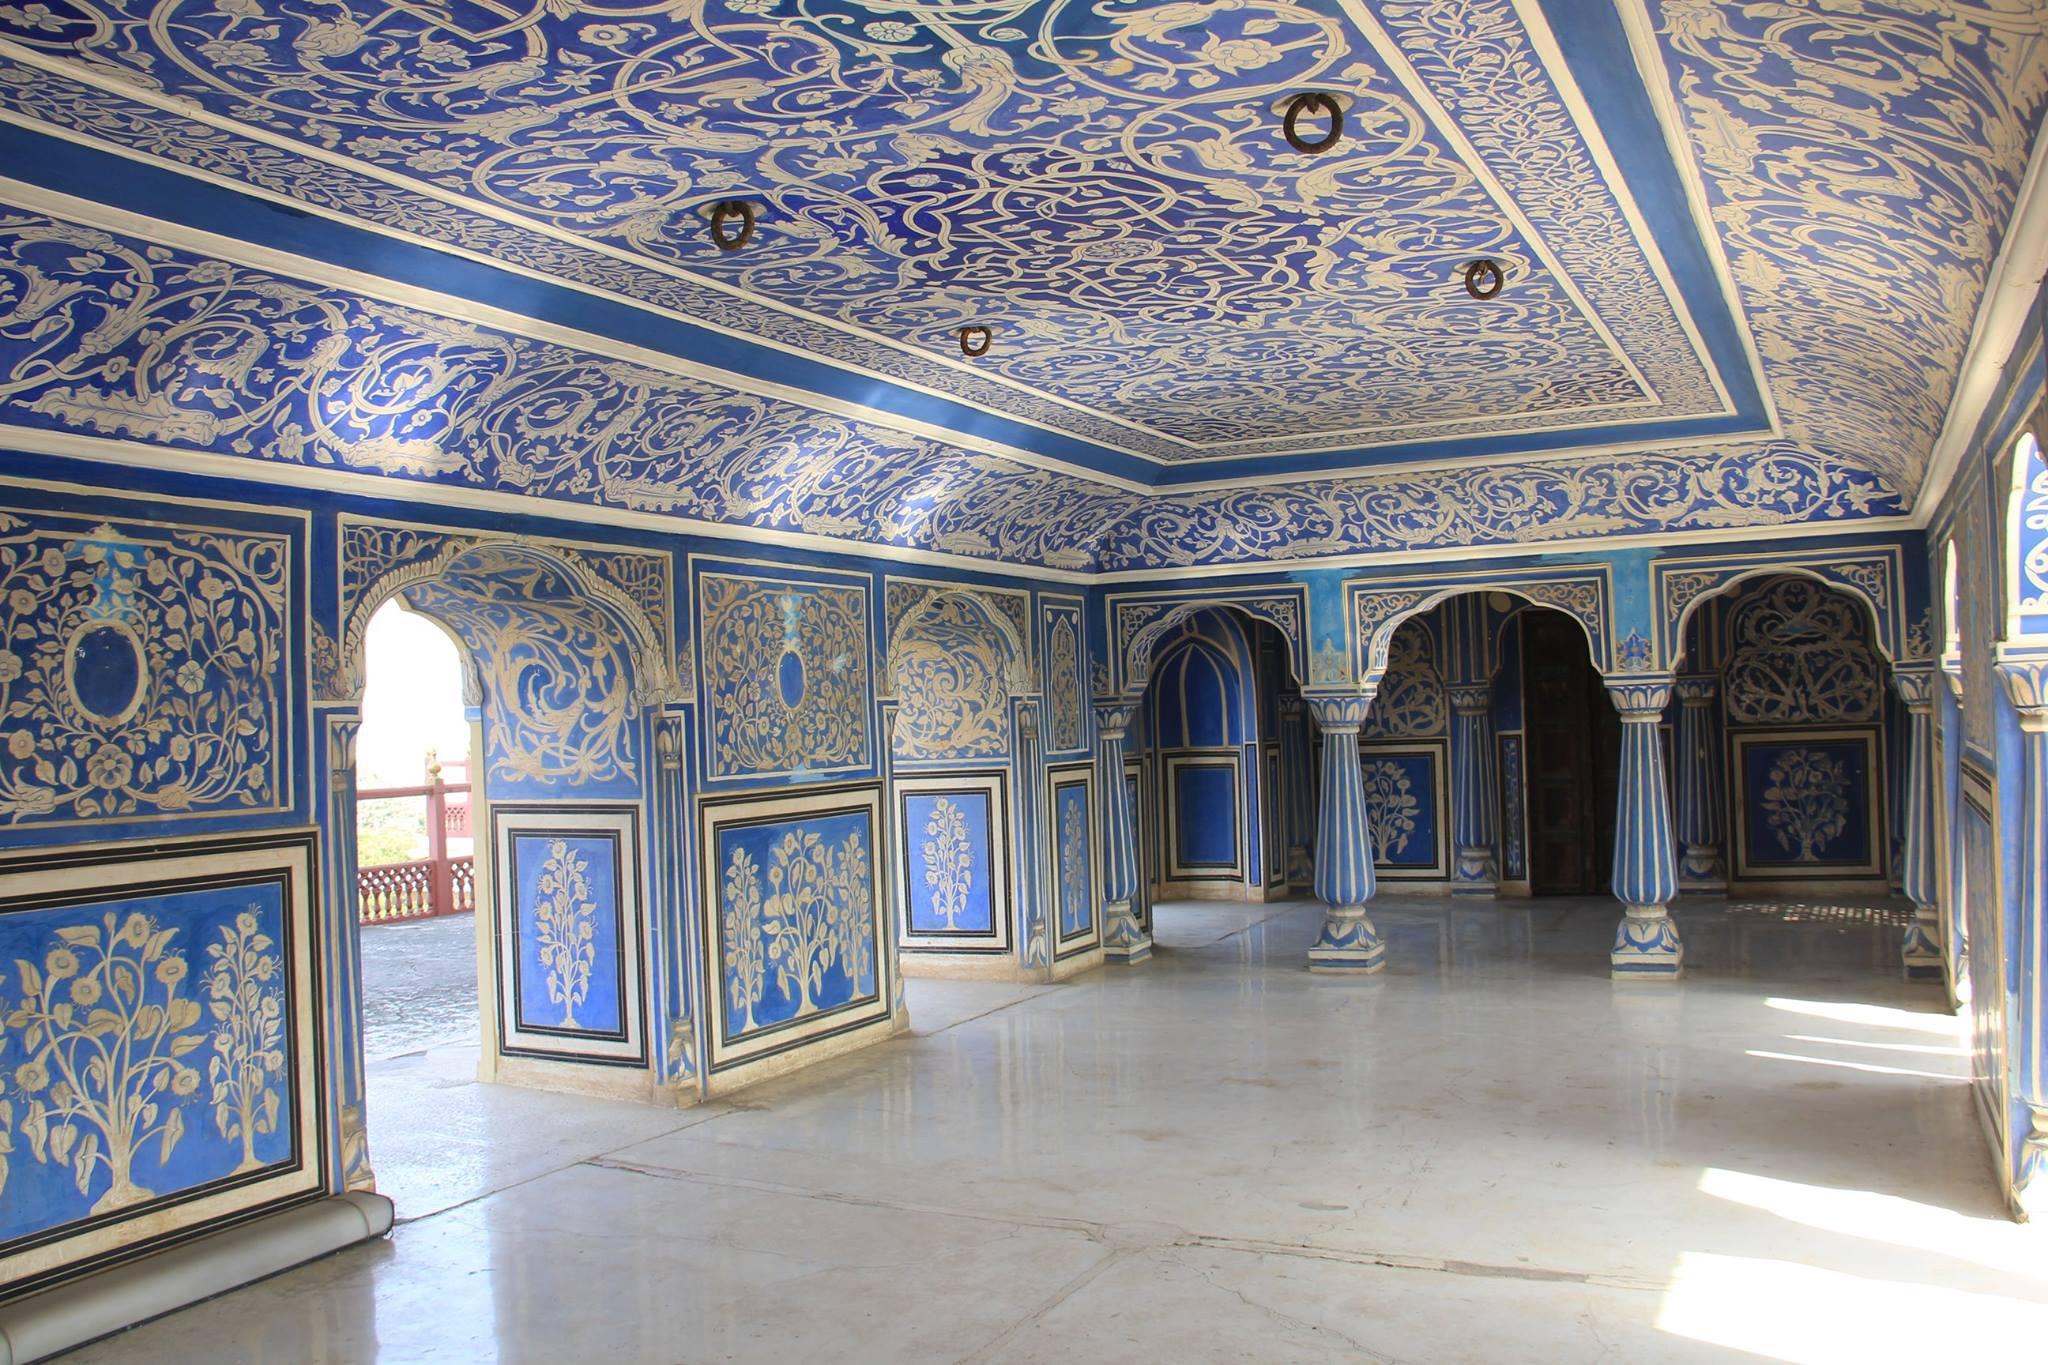 #India #Jaipur #Citypalace